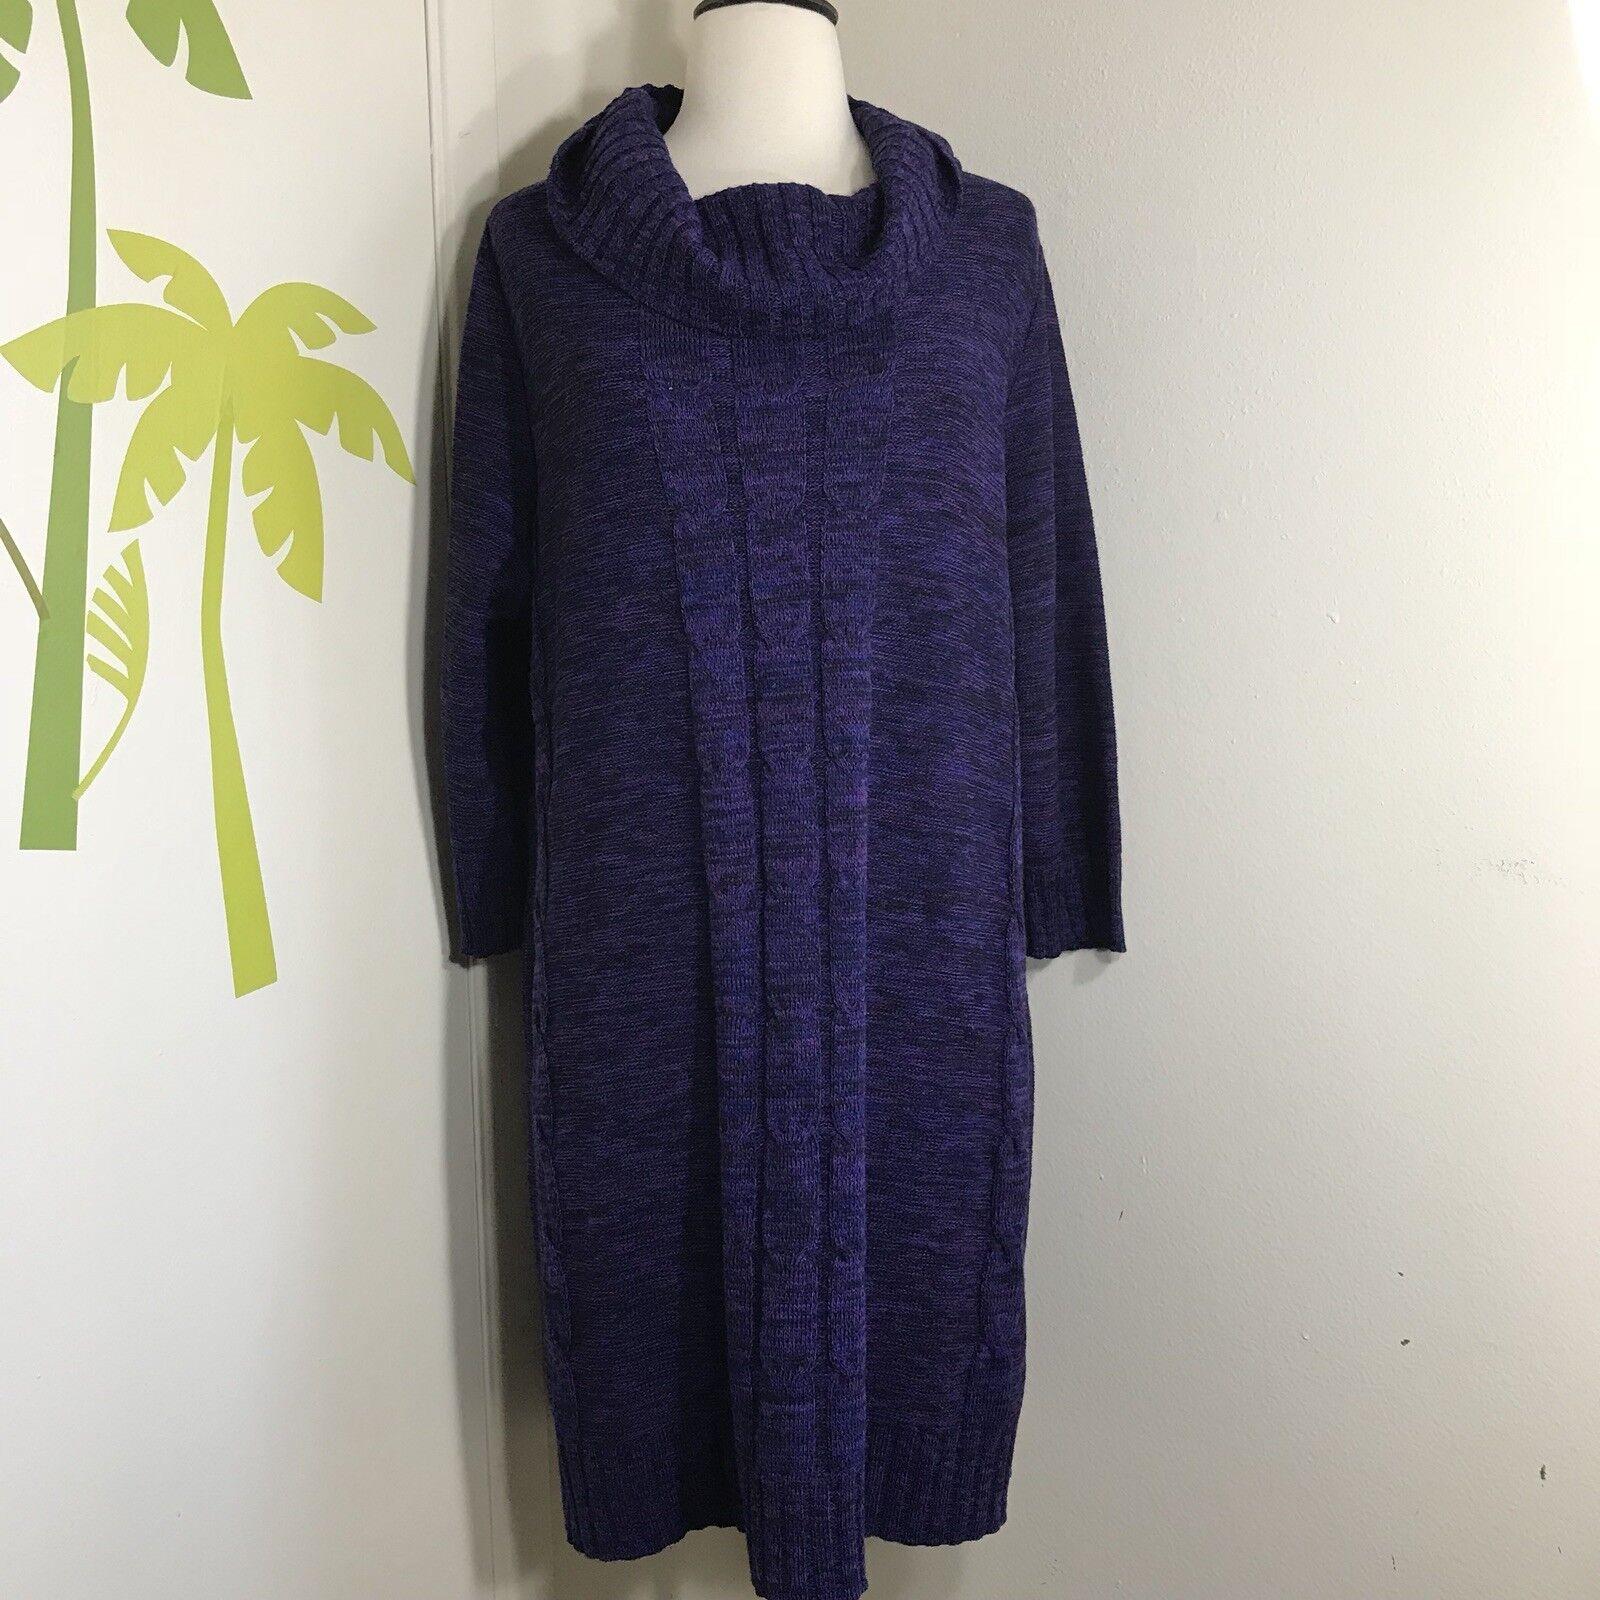 NWT Lane Bryant Purple Cable Knit Sweater Dress Sz 14 16 Acrylic Orig